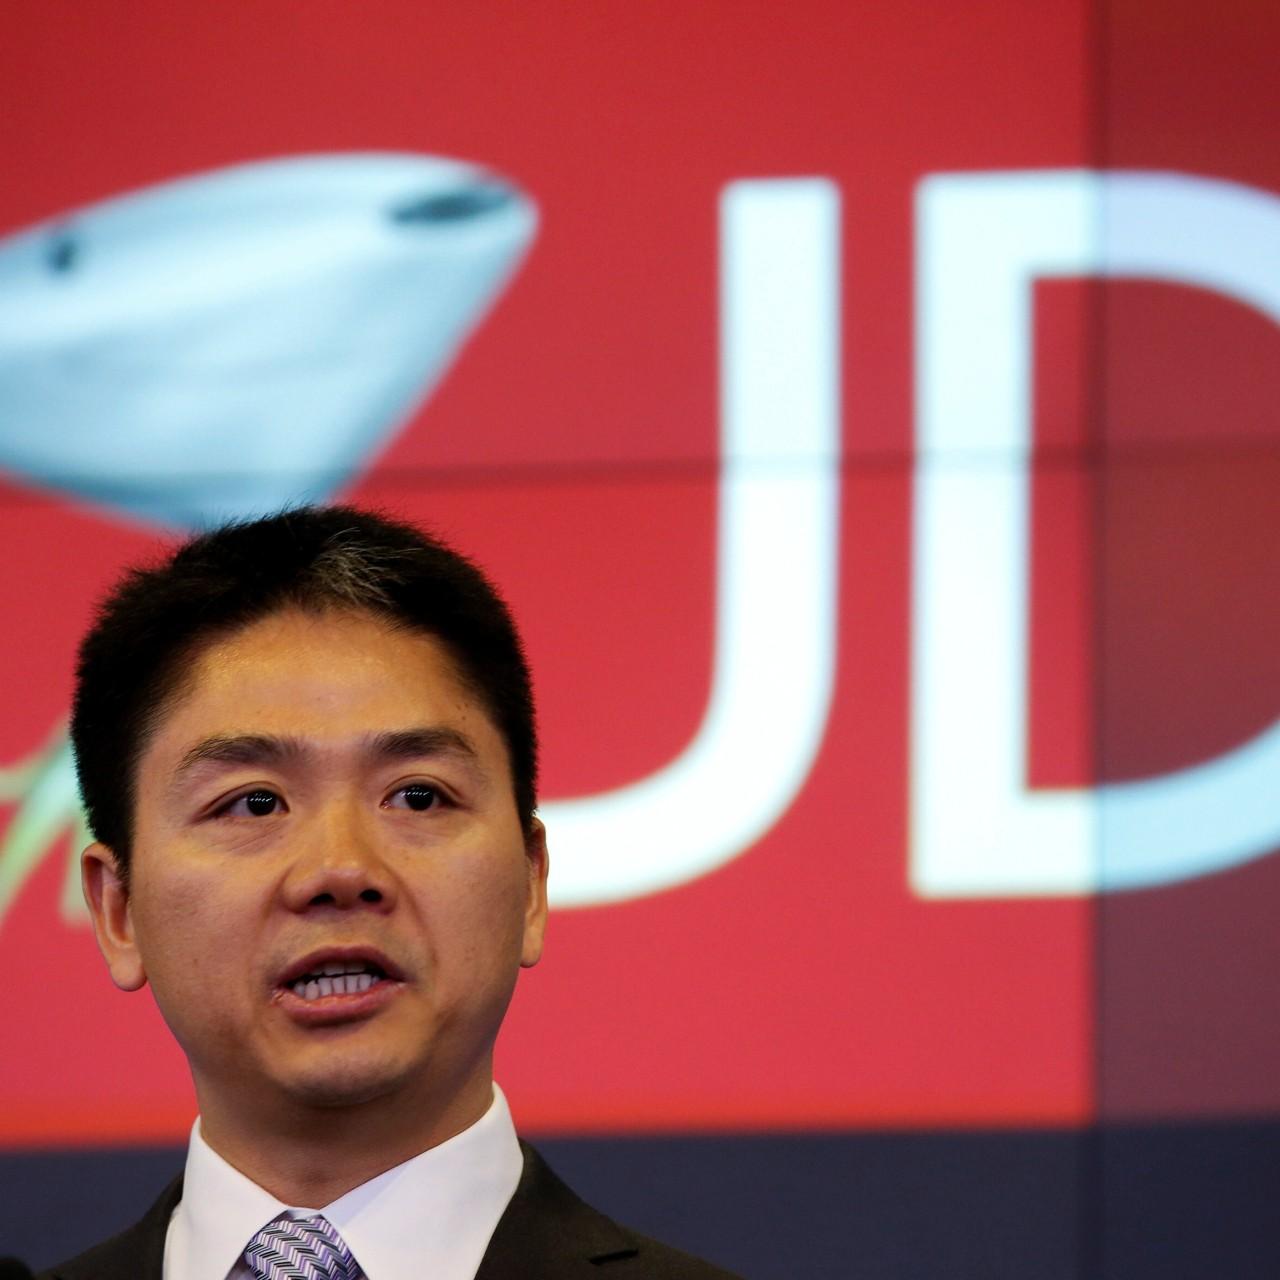 JD com founder Richard Liu sued for alleged rape by Minnesota